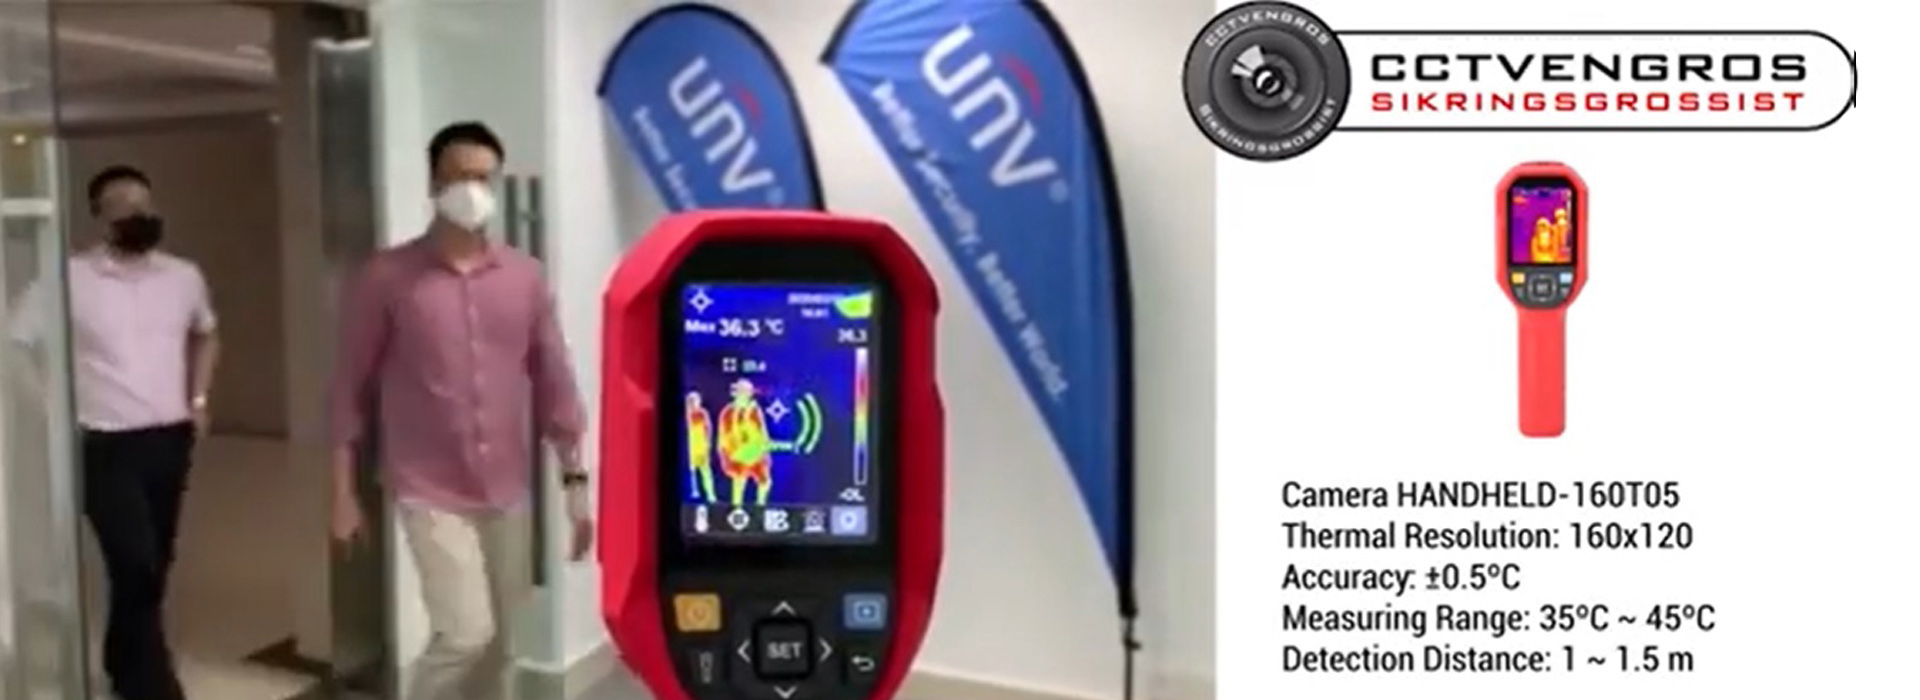 Cctv videoovervågning - Corona camera